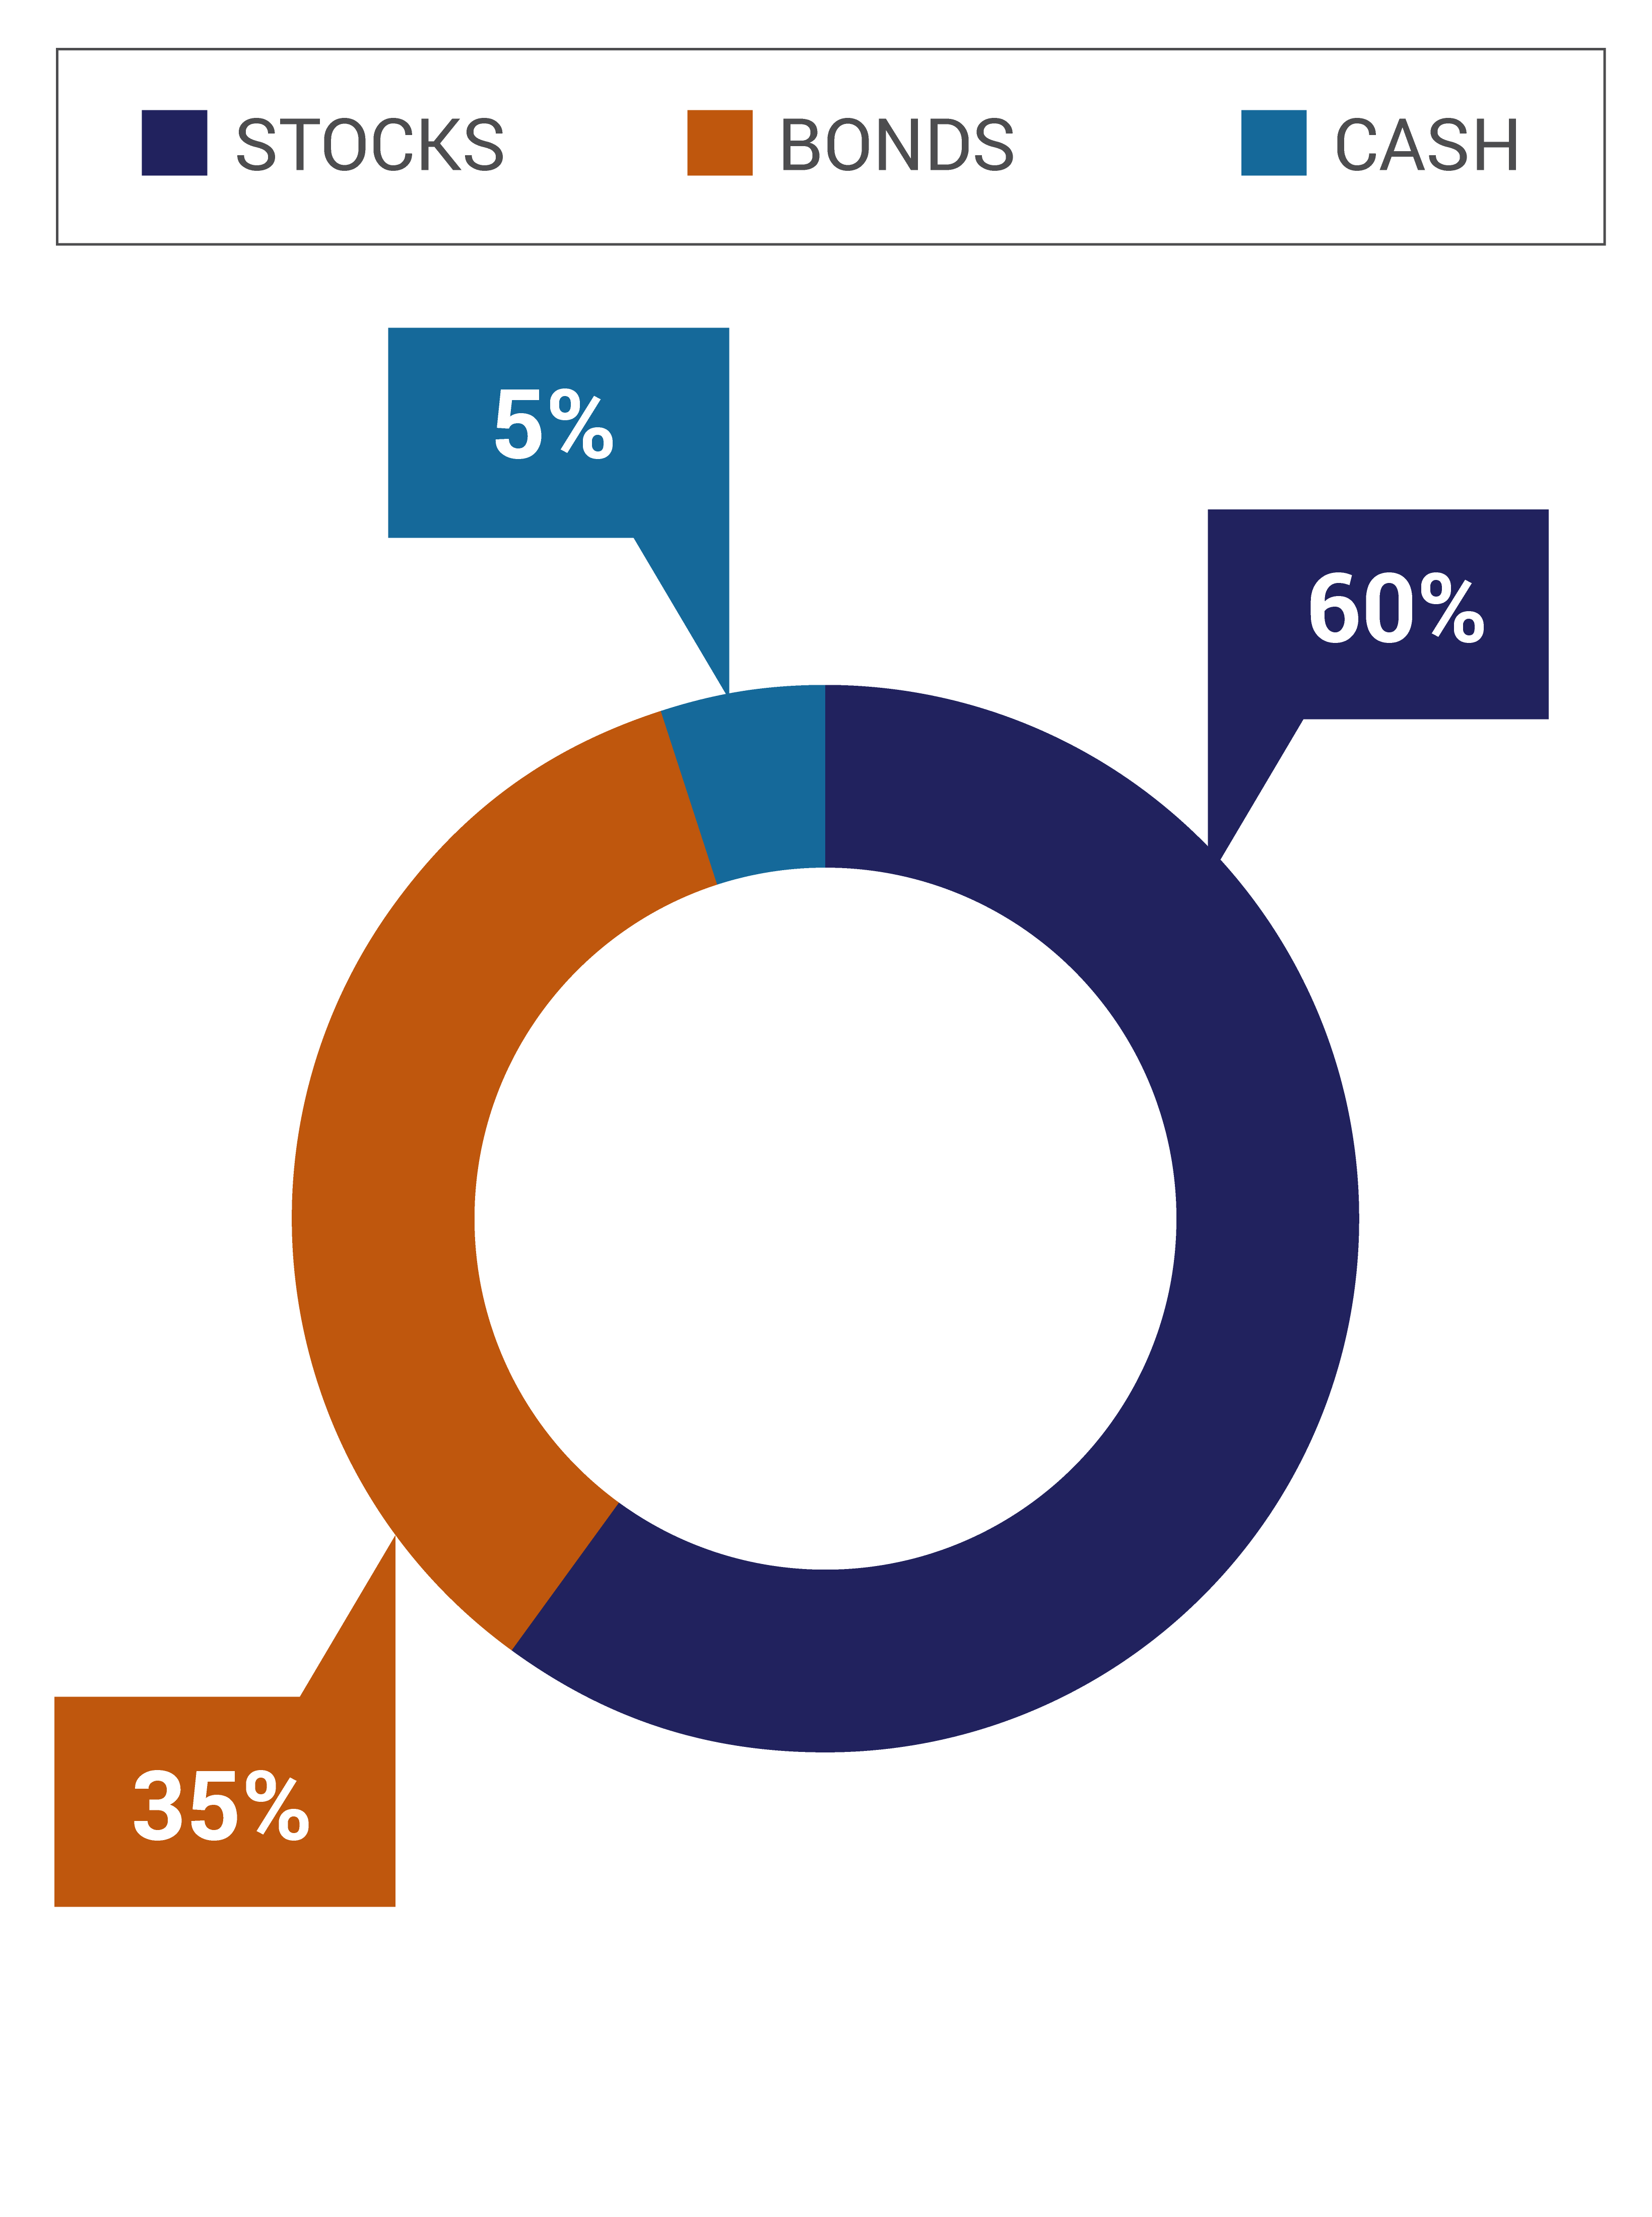 The Moderate Portfolio Option consists of 60% Stocks, 35% Bonds, and 5% Cash.